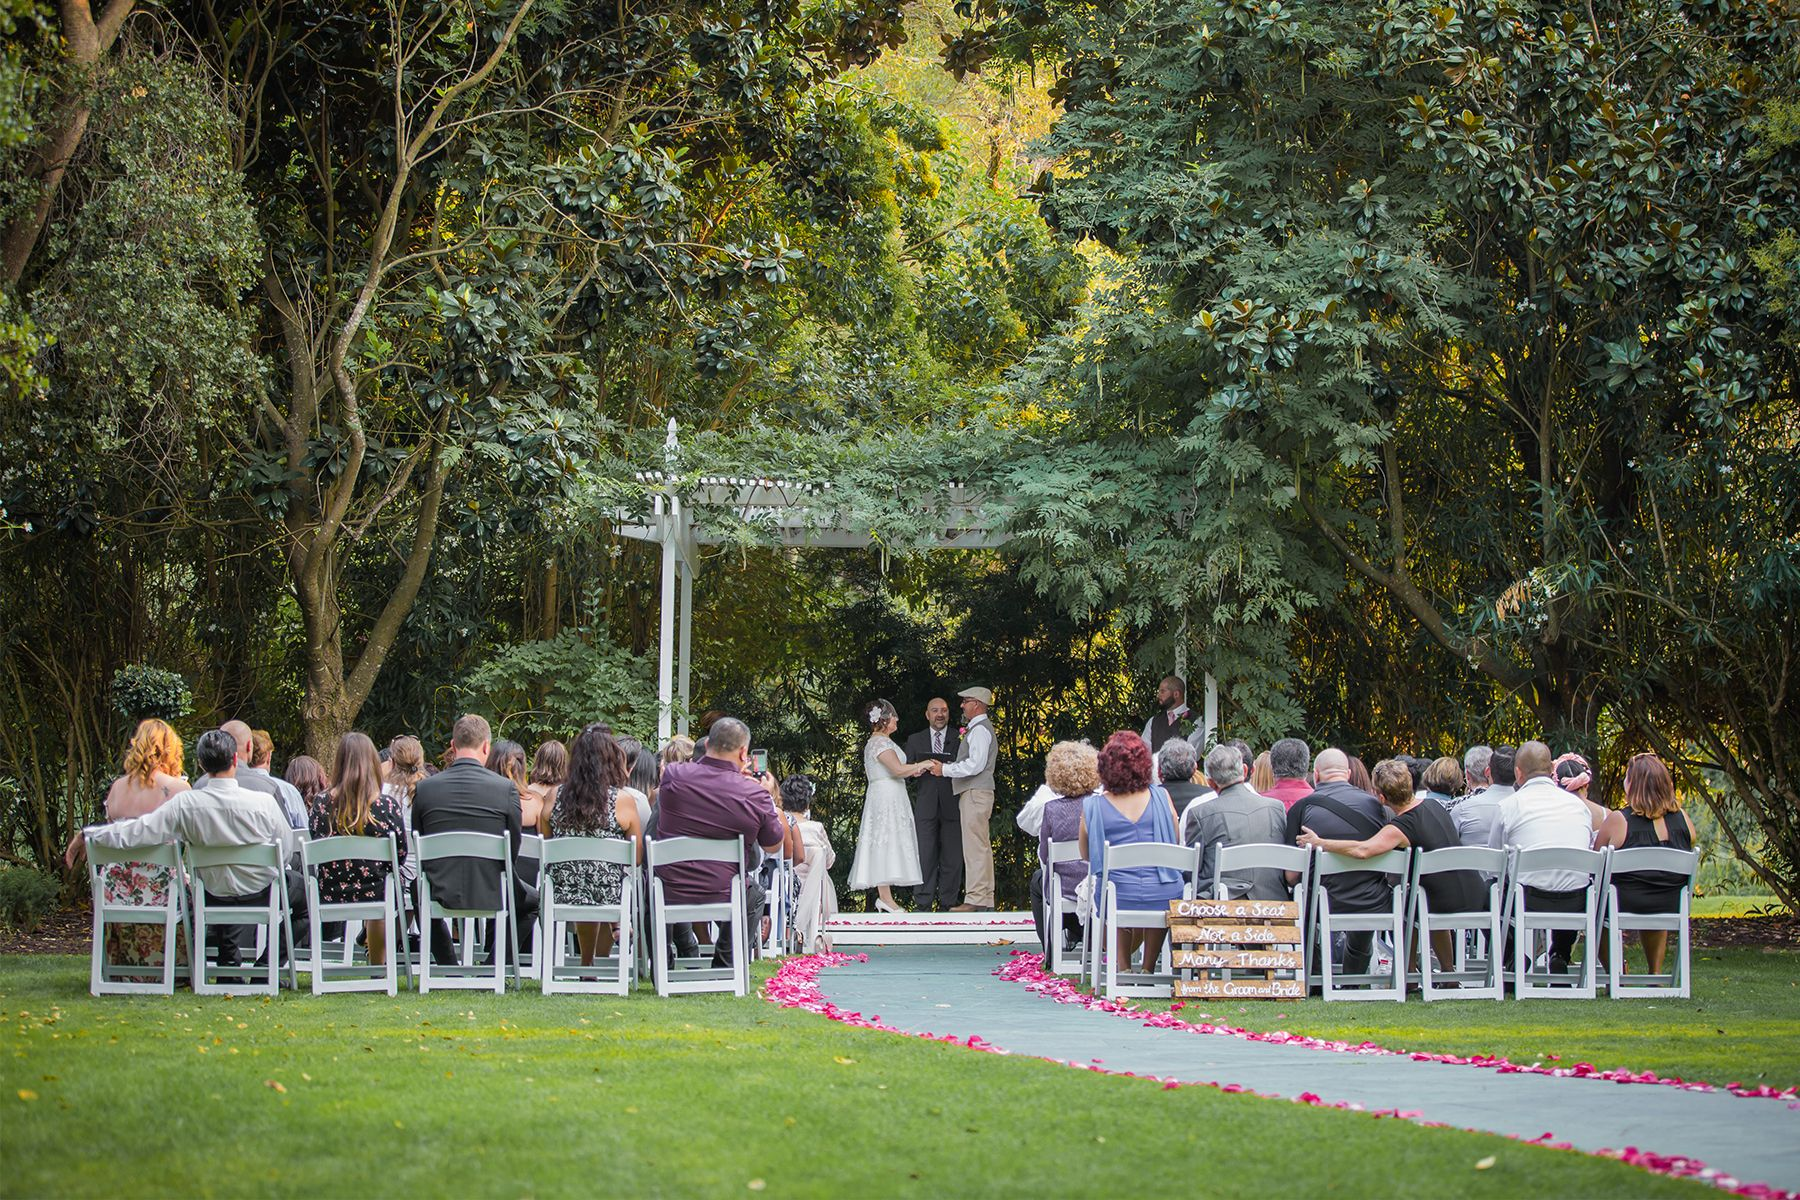 backyard wedding venues in orange county ca%0A Wedgewood Weddings   Redwood Canyon   Rustic Outdoor Scenic Castro Valley Wedding  Venue   Northern California